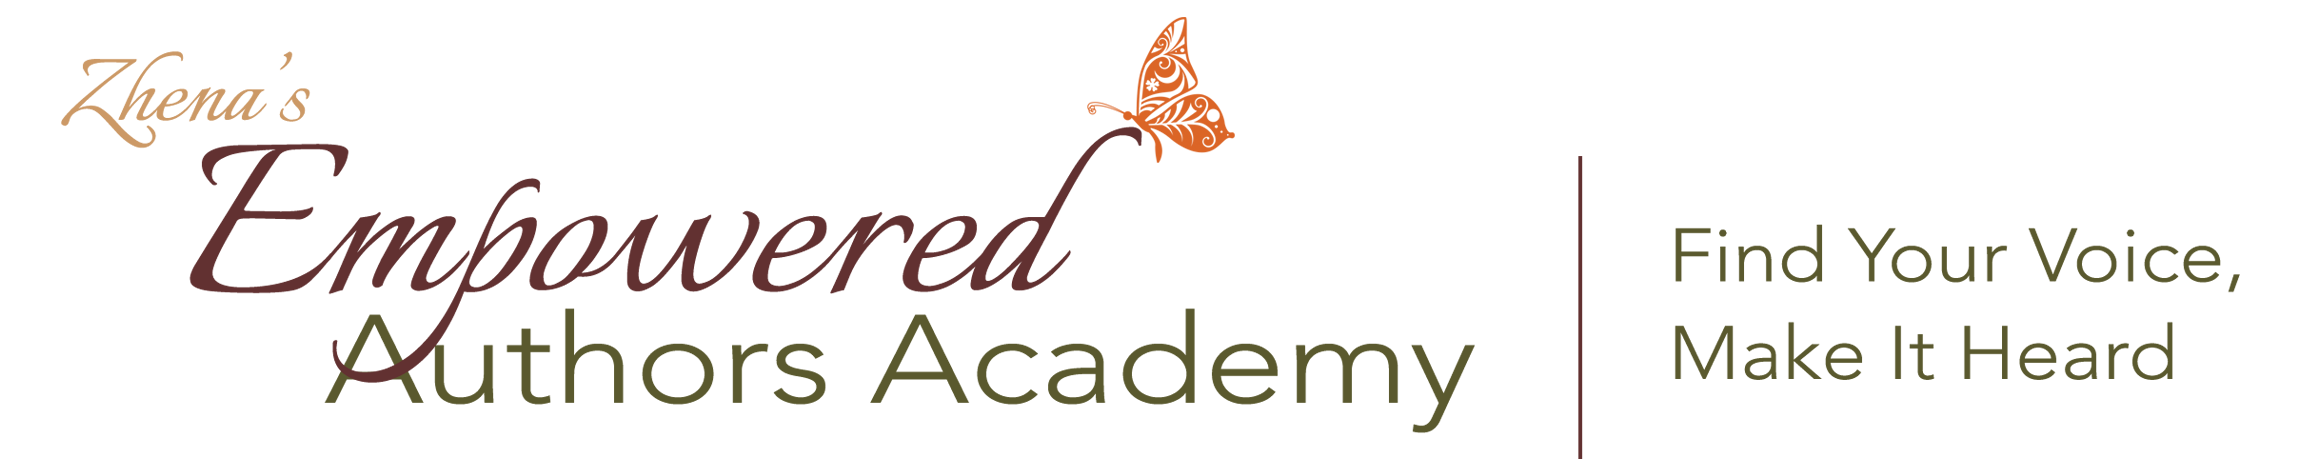 Empowered Author's Academy